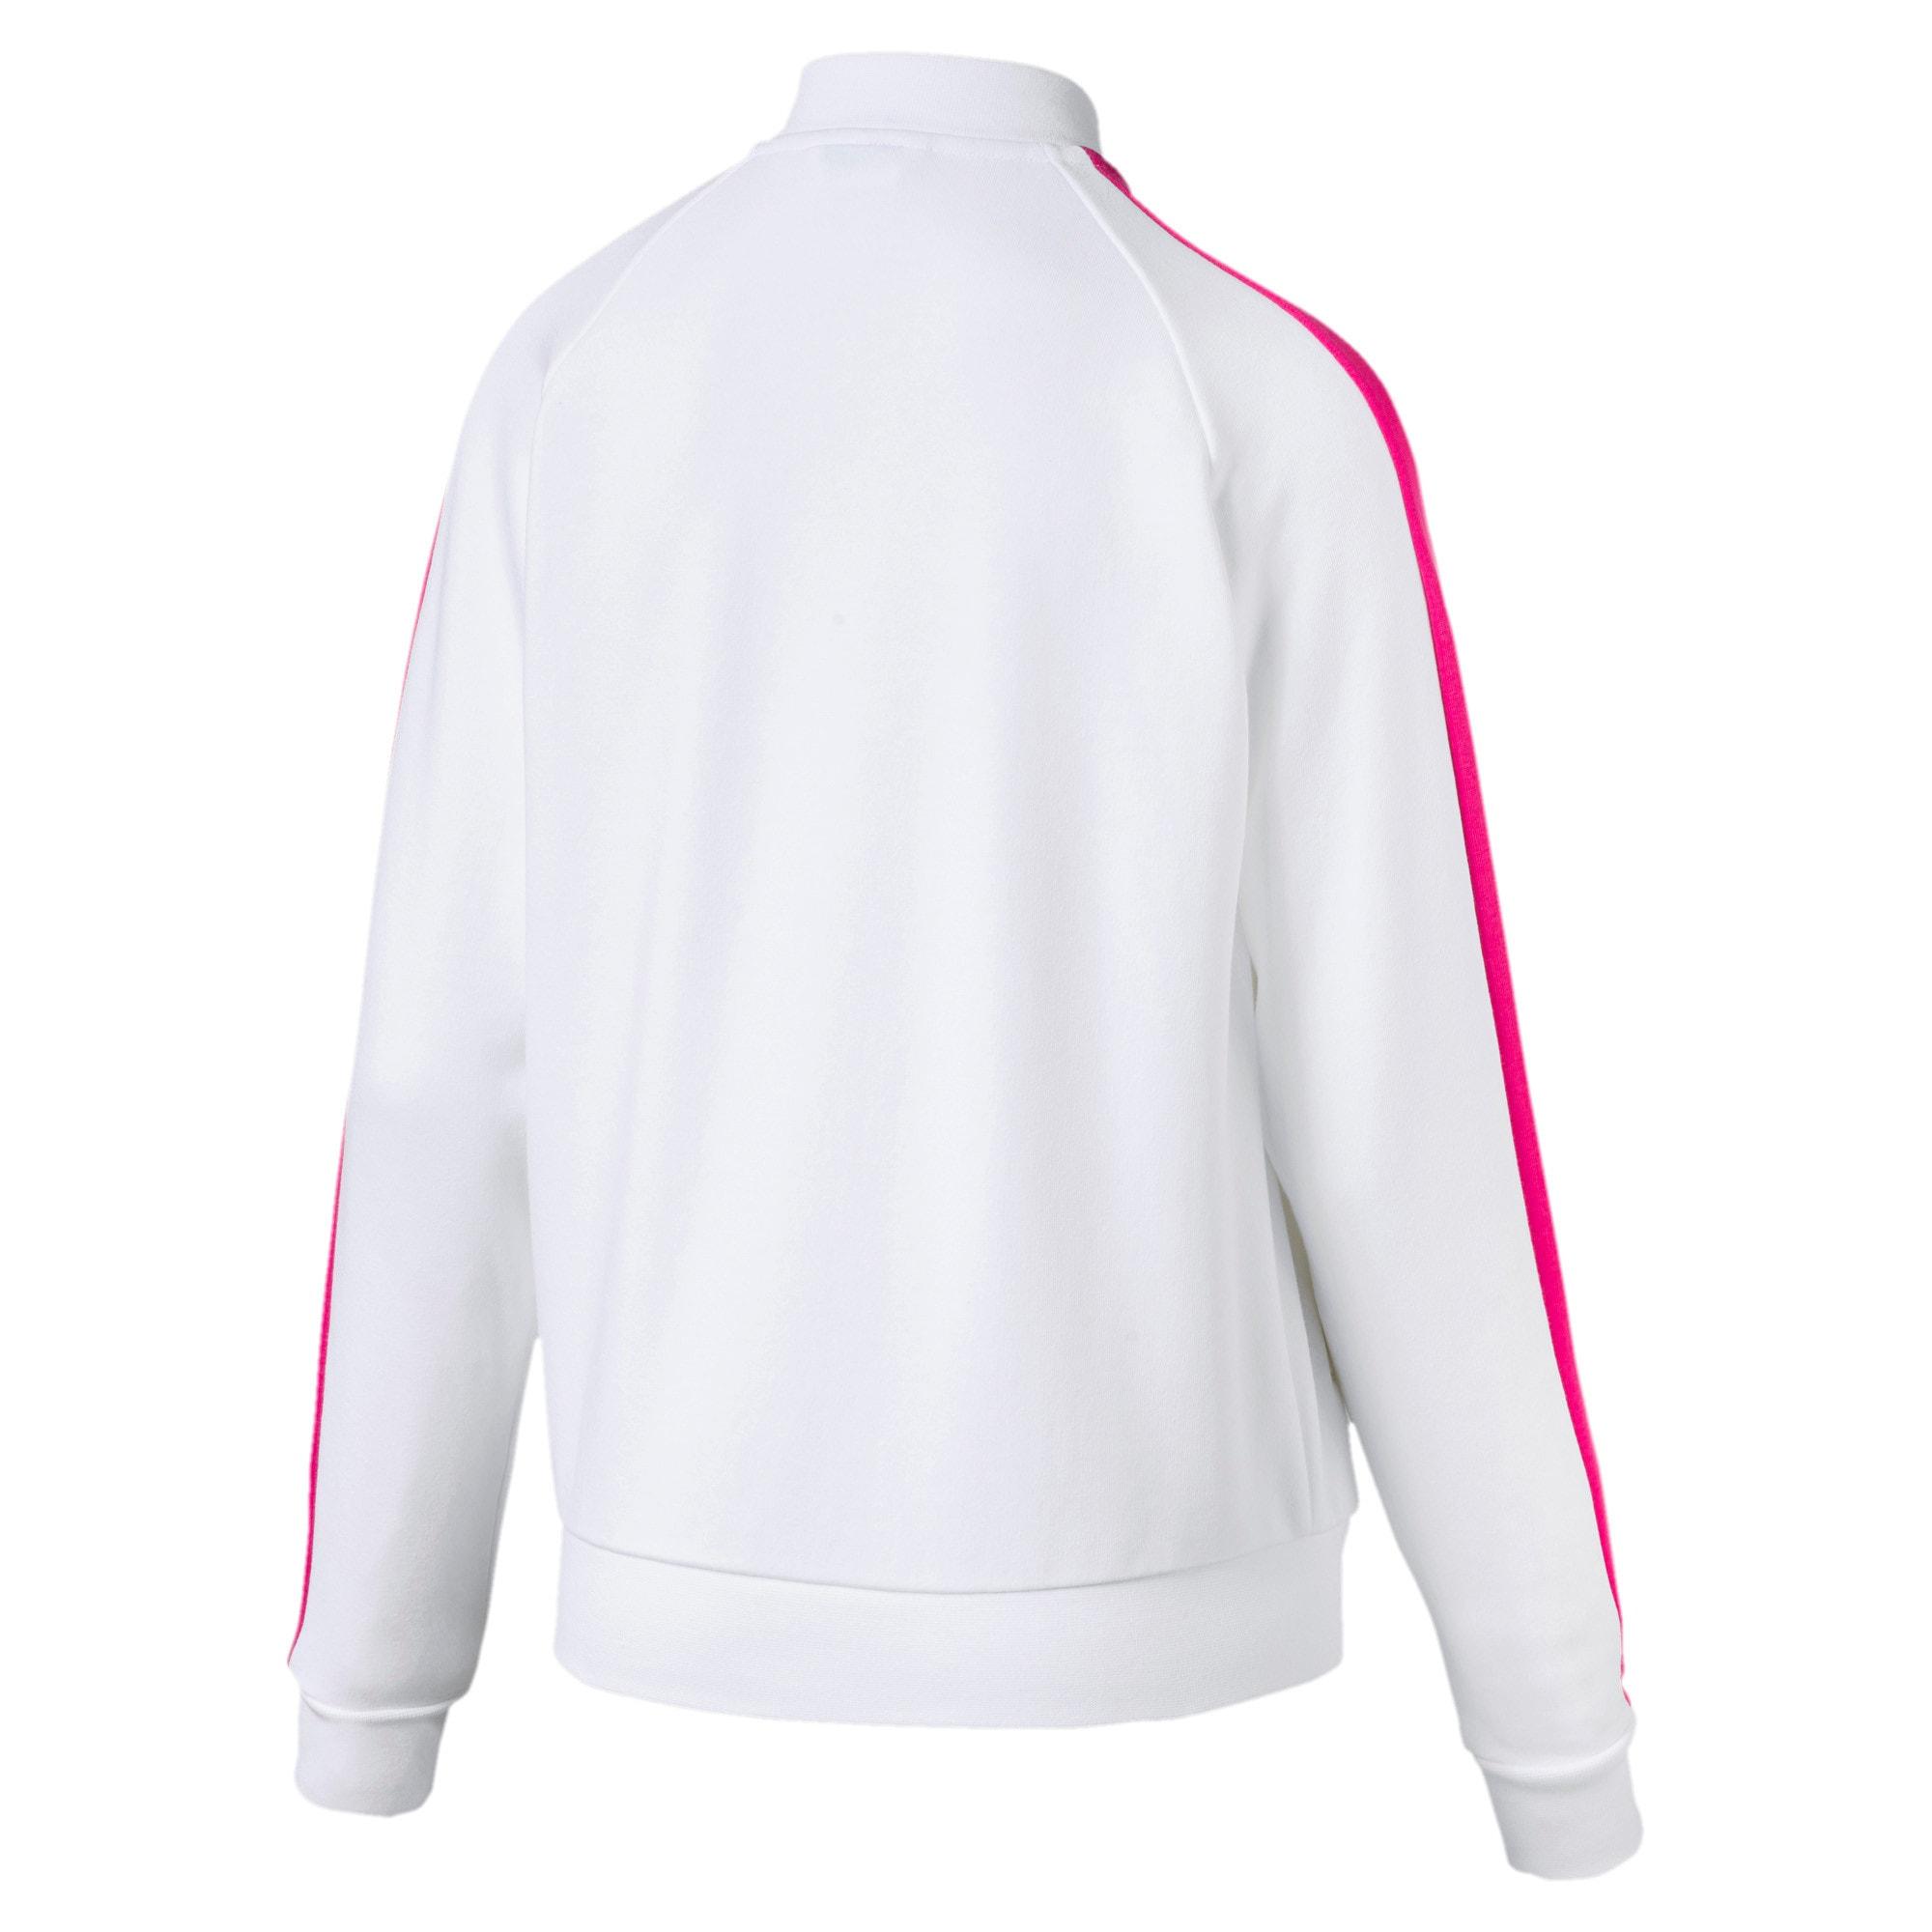 Thumbnail 3 of Classics Women's T7 Track Jacket, Puma White -1, medium